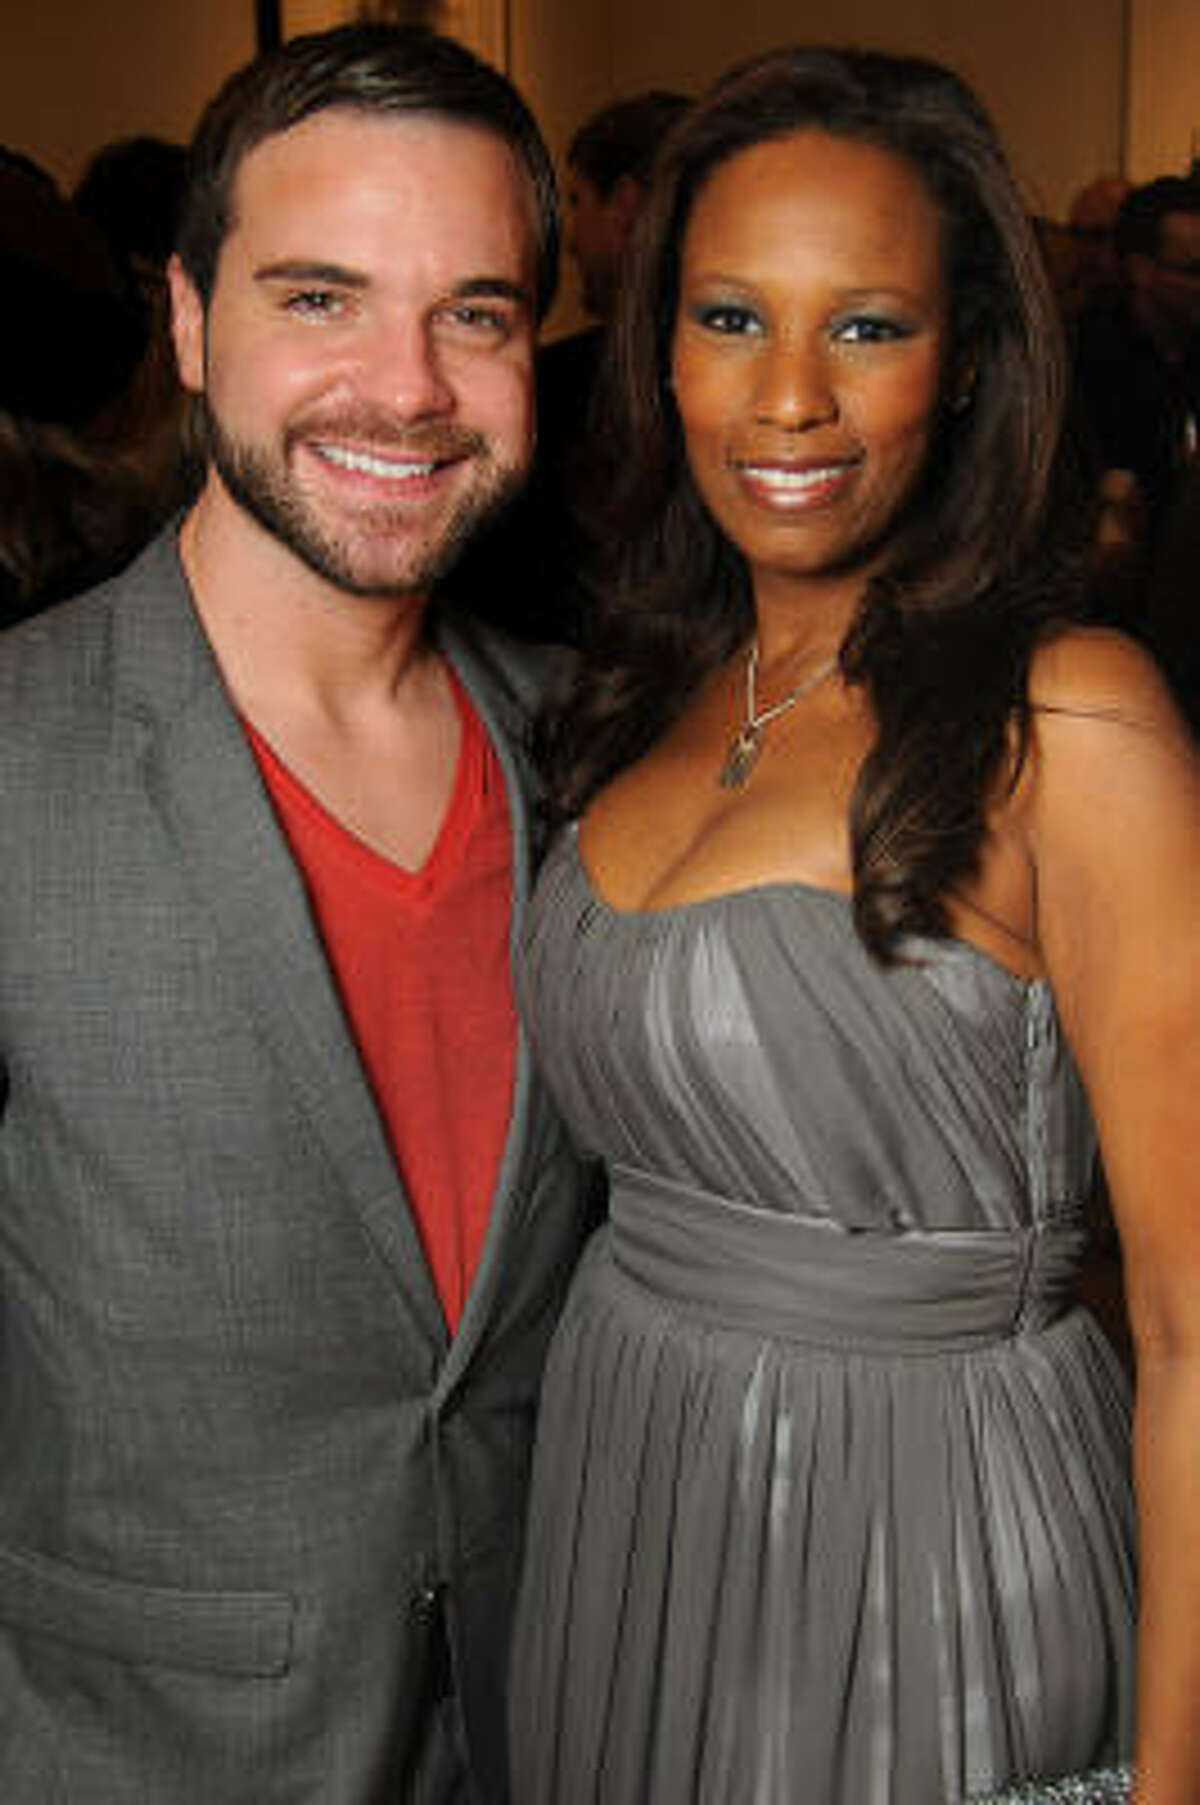 Nathan Kasselder and Michelle Profit